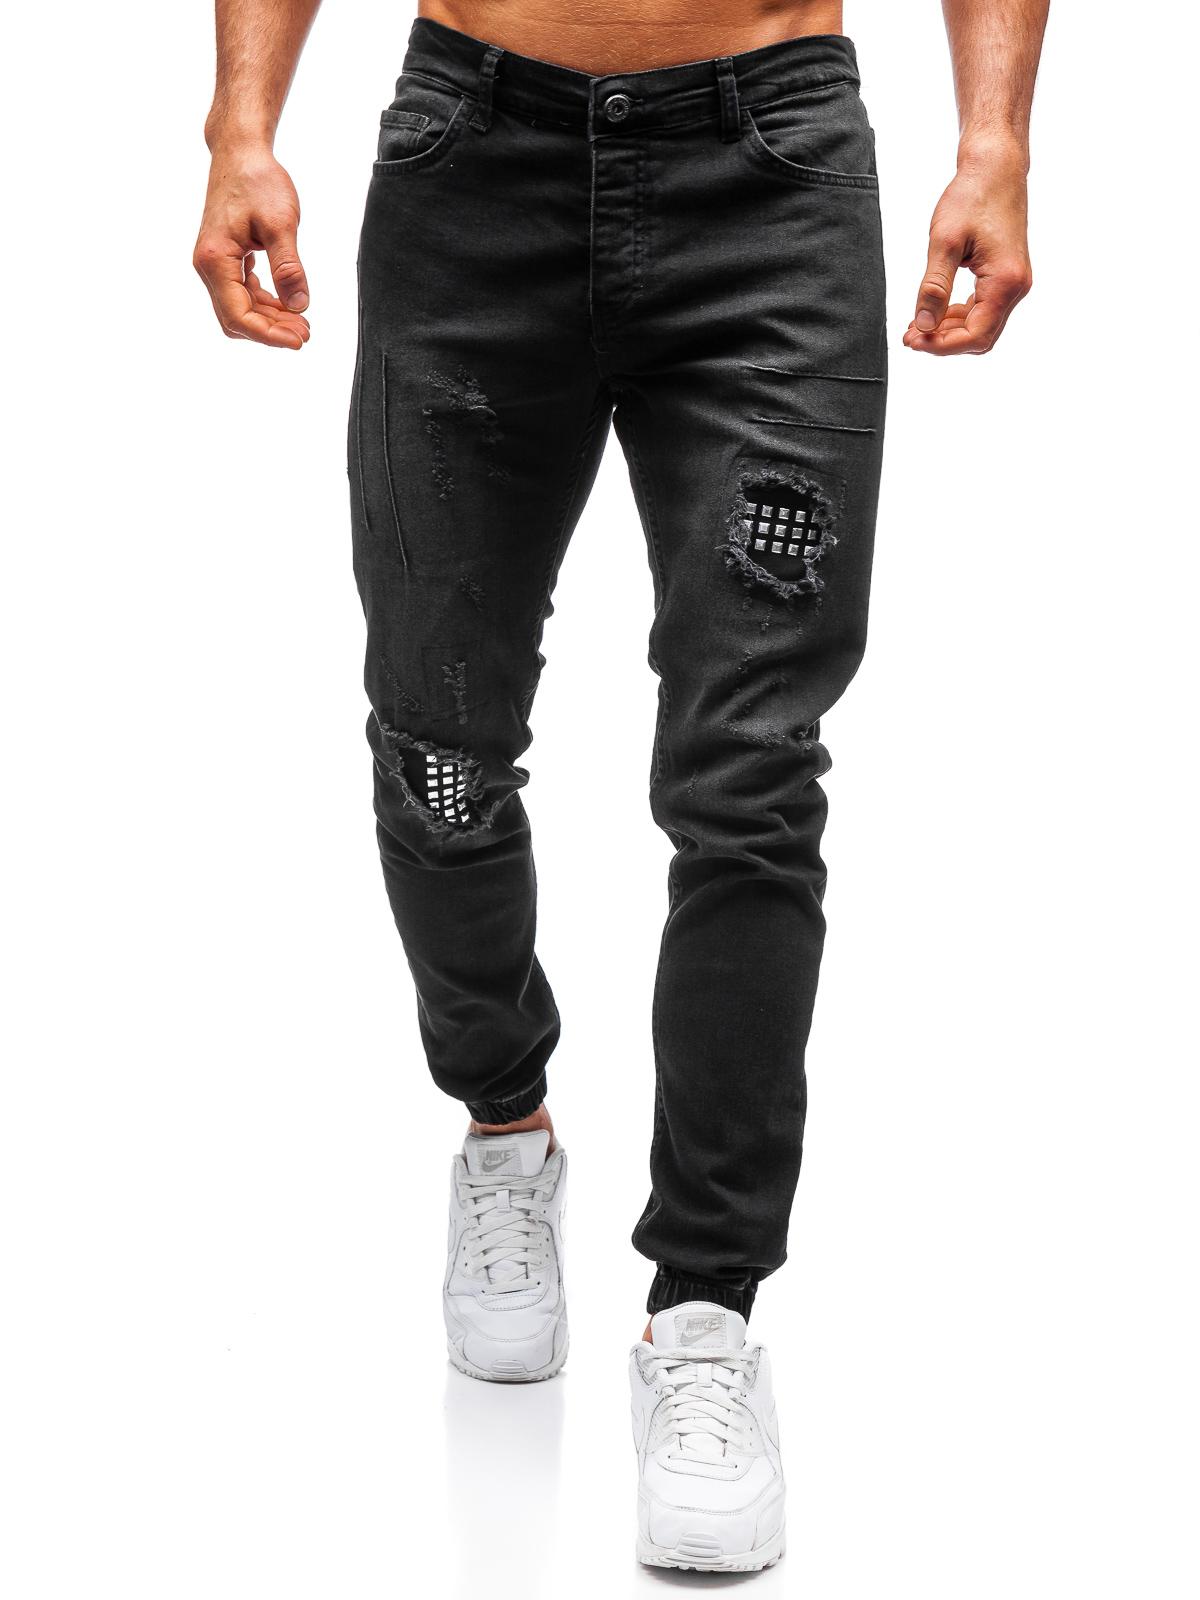 Jeans Hose Freizeithose Denim Clubwear Classic Casual Herren BOLF 6F6 Motiv